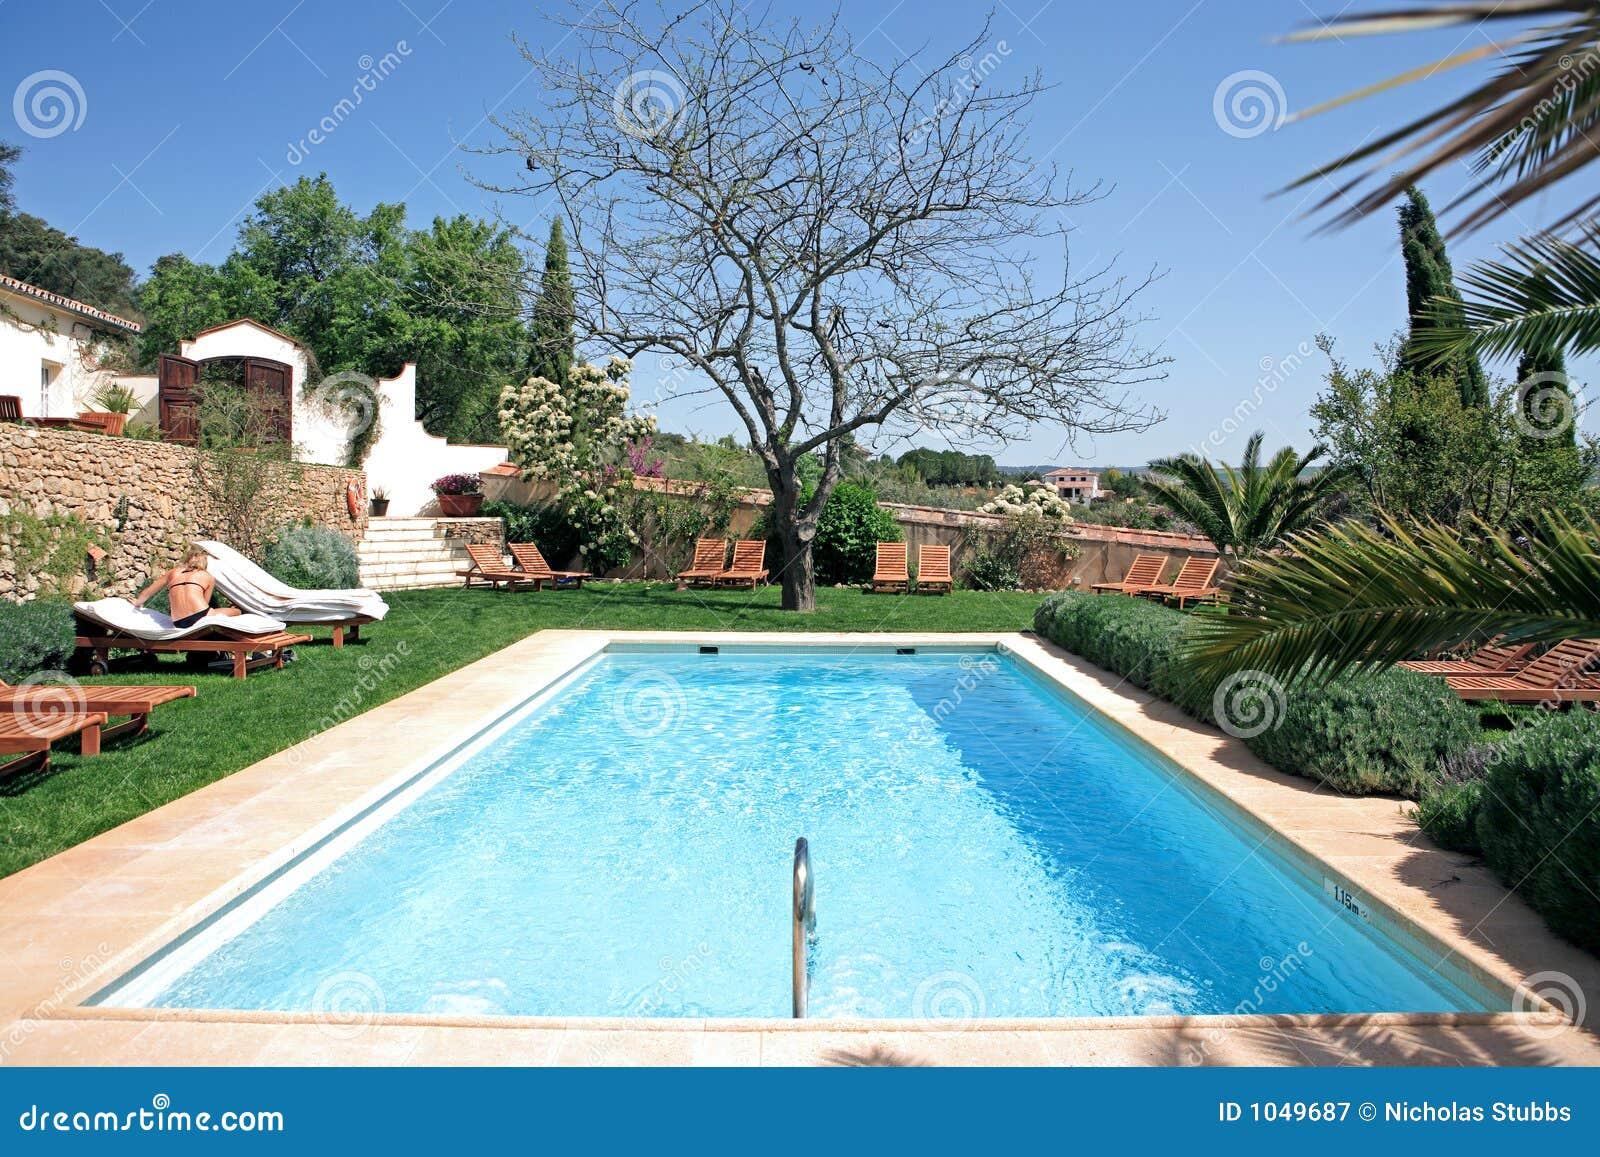 Hotel e piscina rustici di lusso in campagna fotografia - Immagini di giardini di villette ...